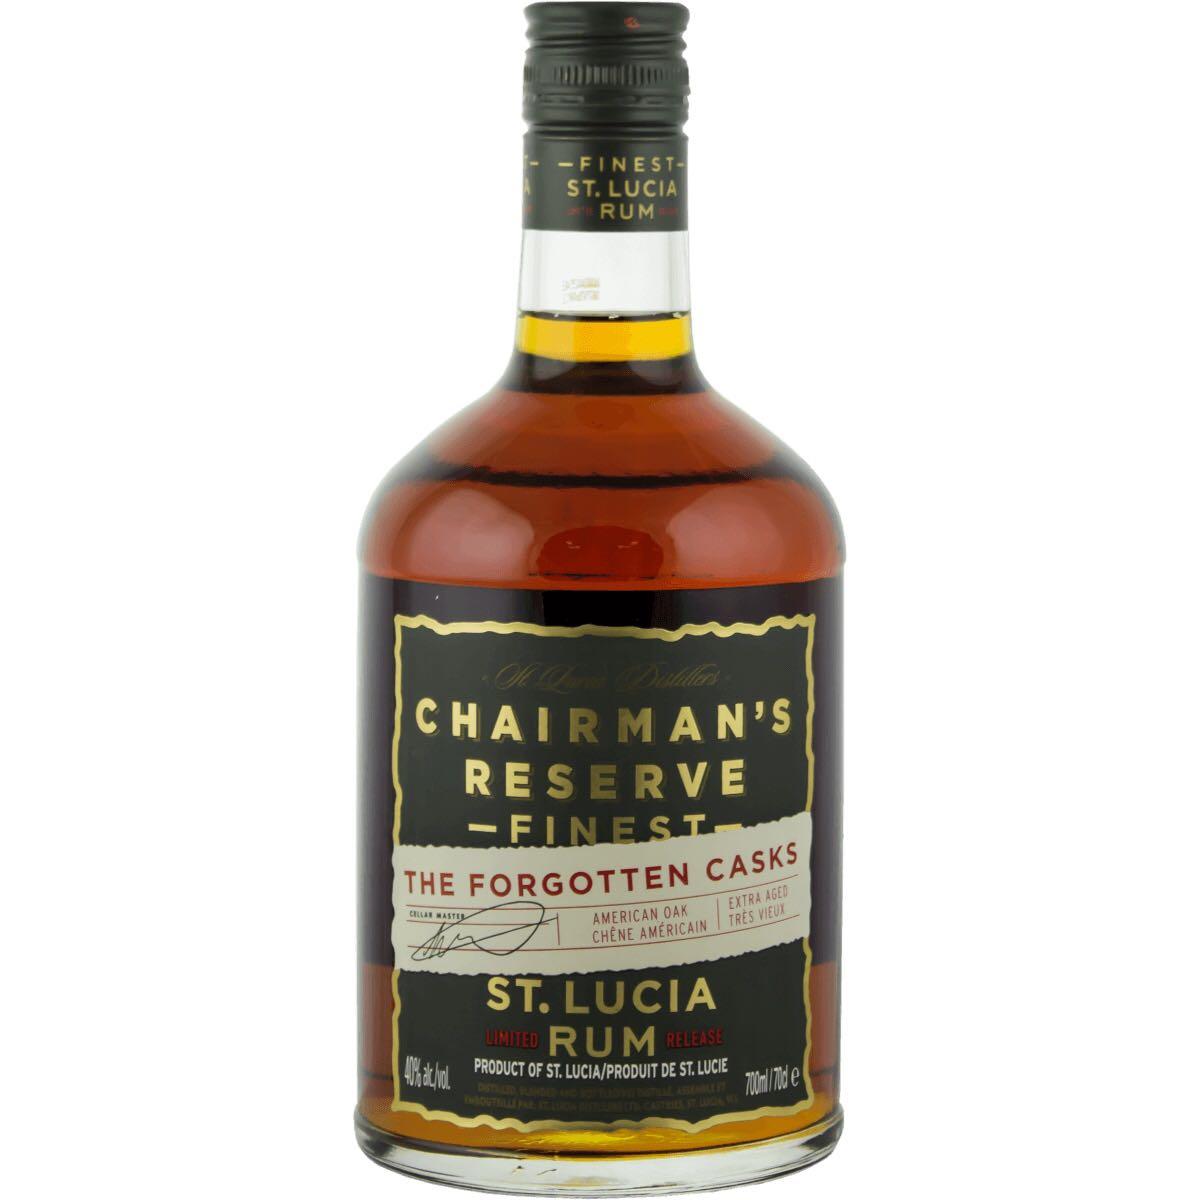 Bottle image of Chairman's Reserve The Forgotten Casks